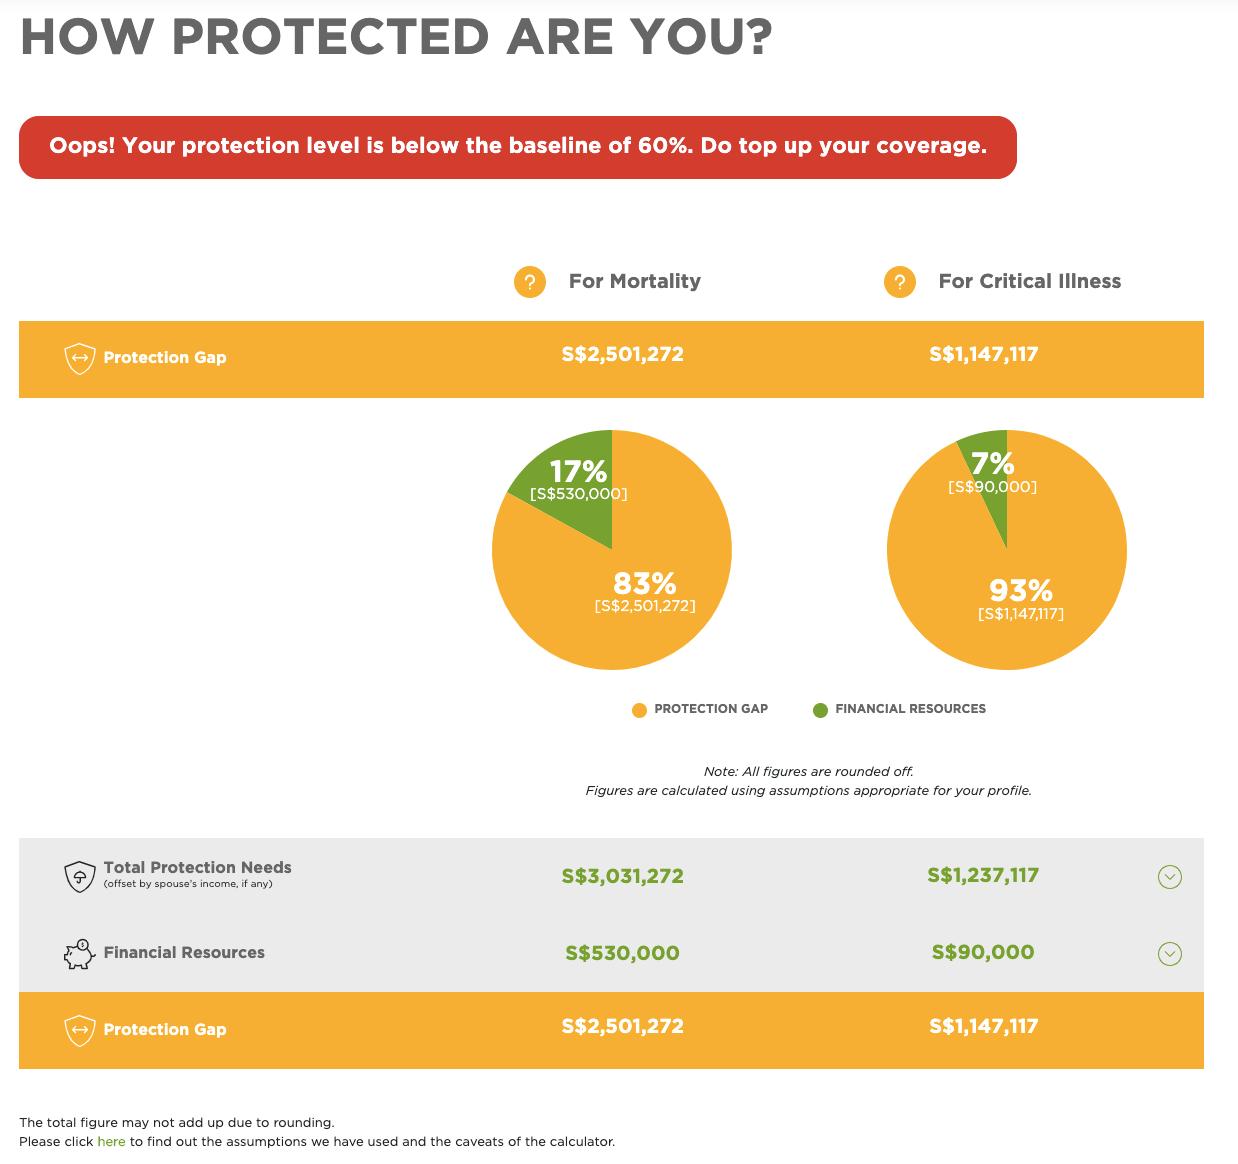 Protection gap